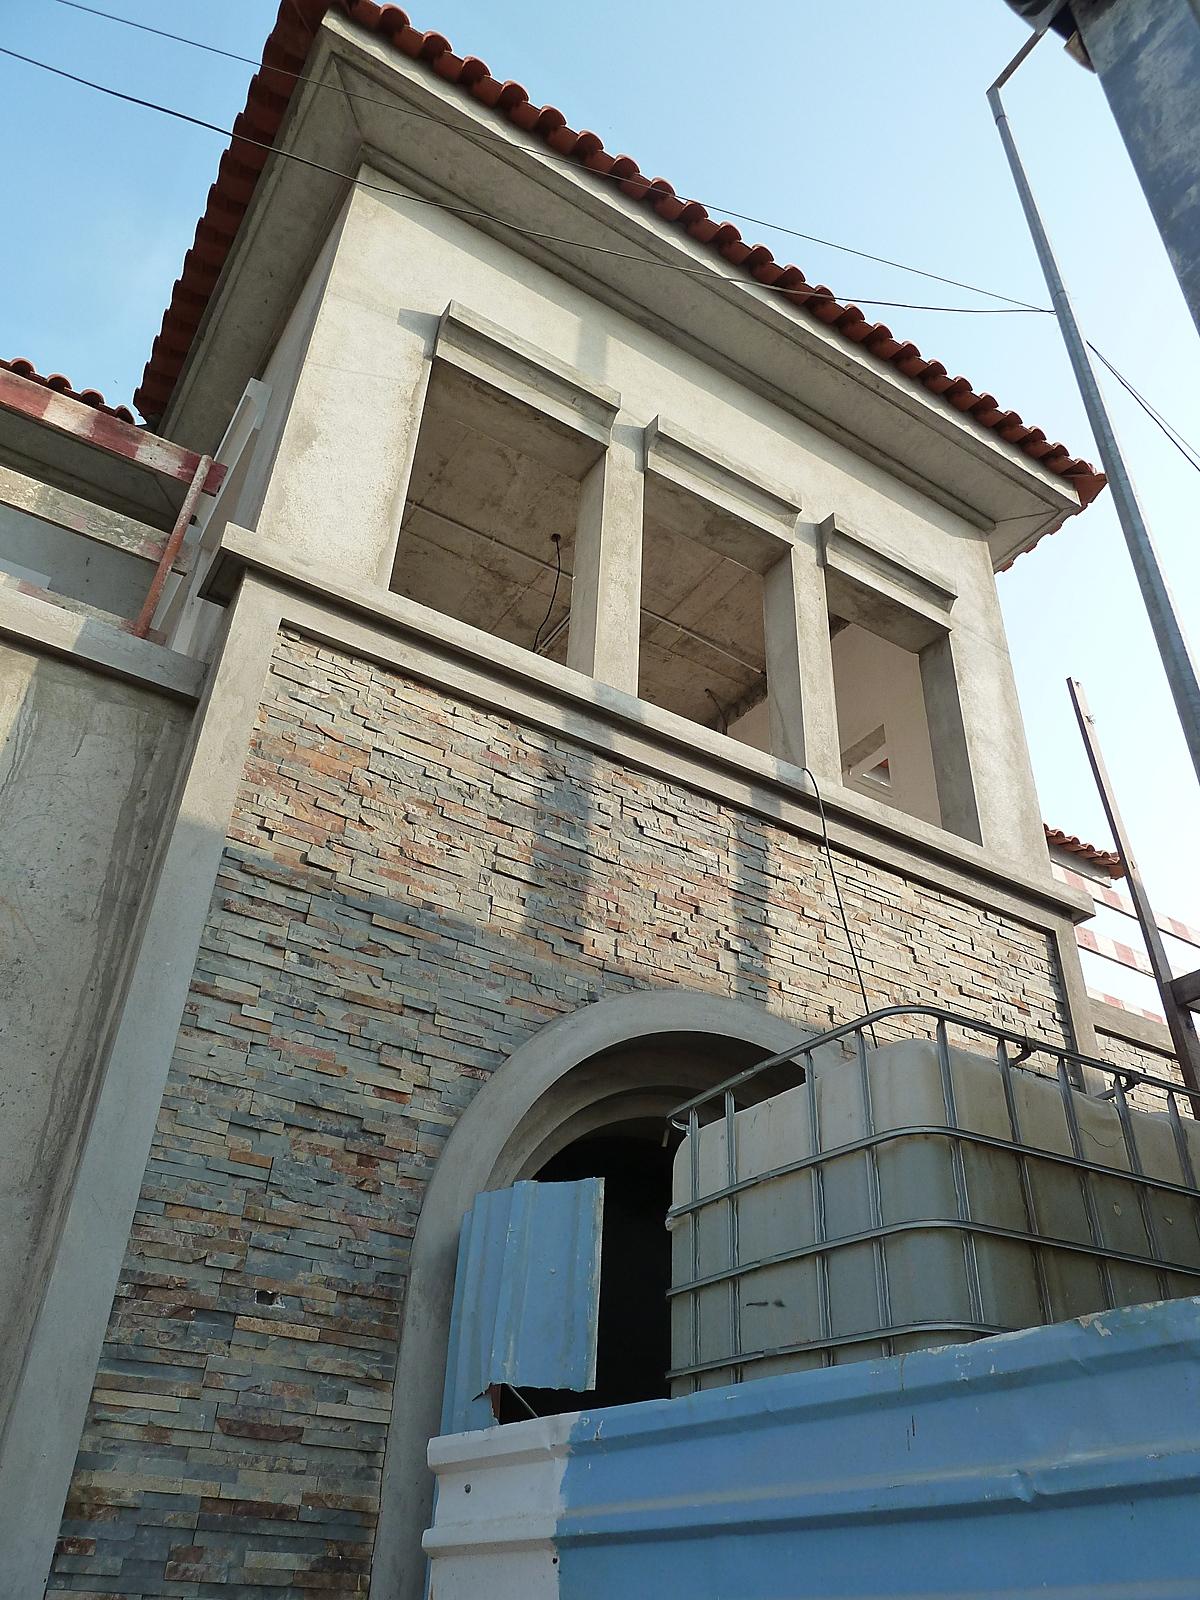 05/14/11: Front Facade tiling in progress